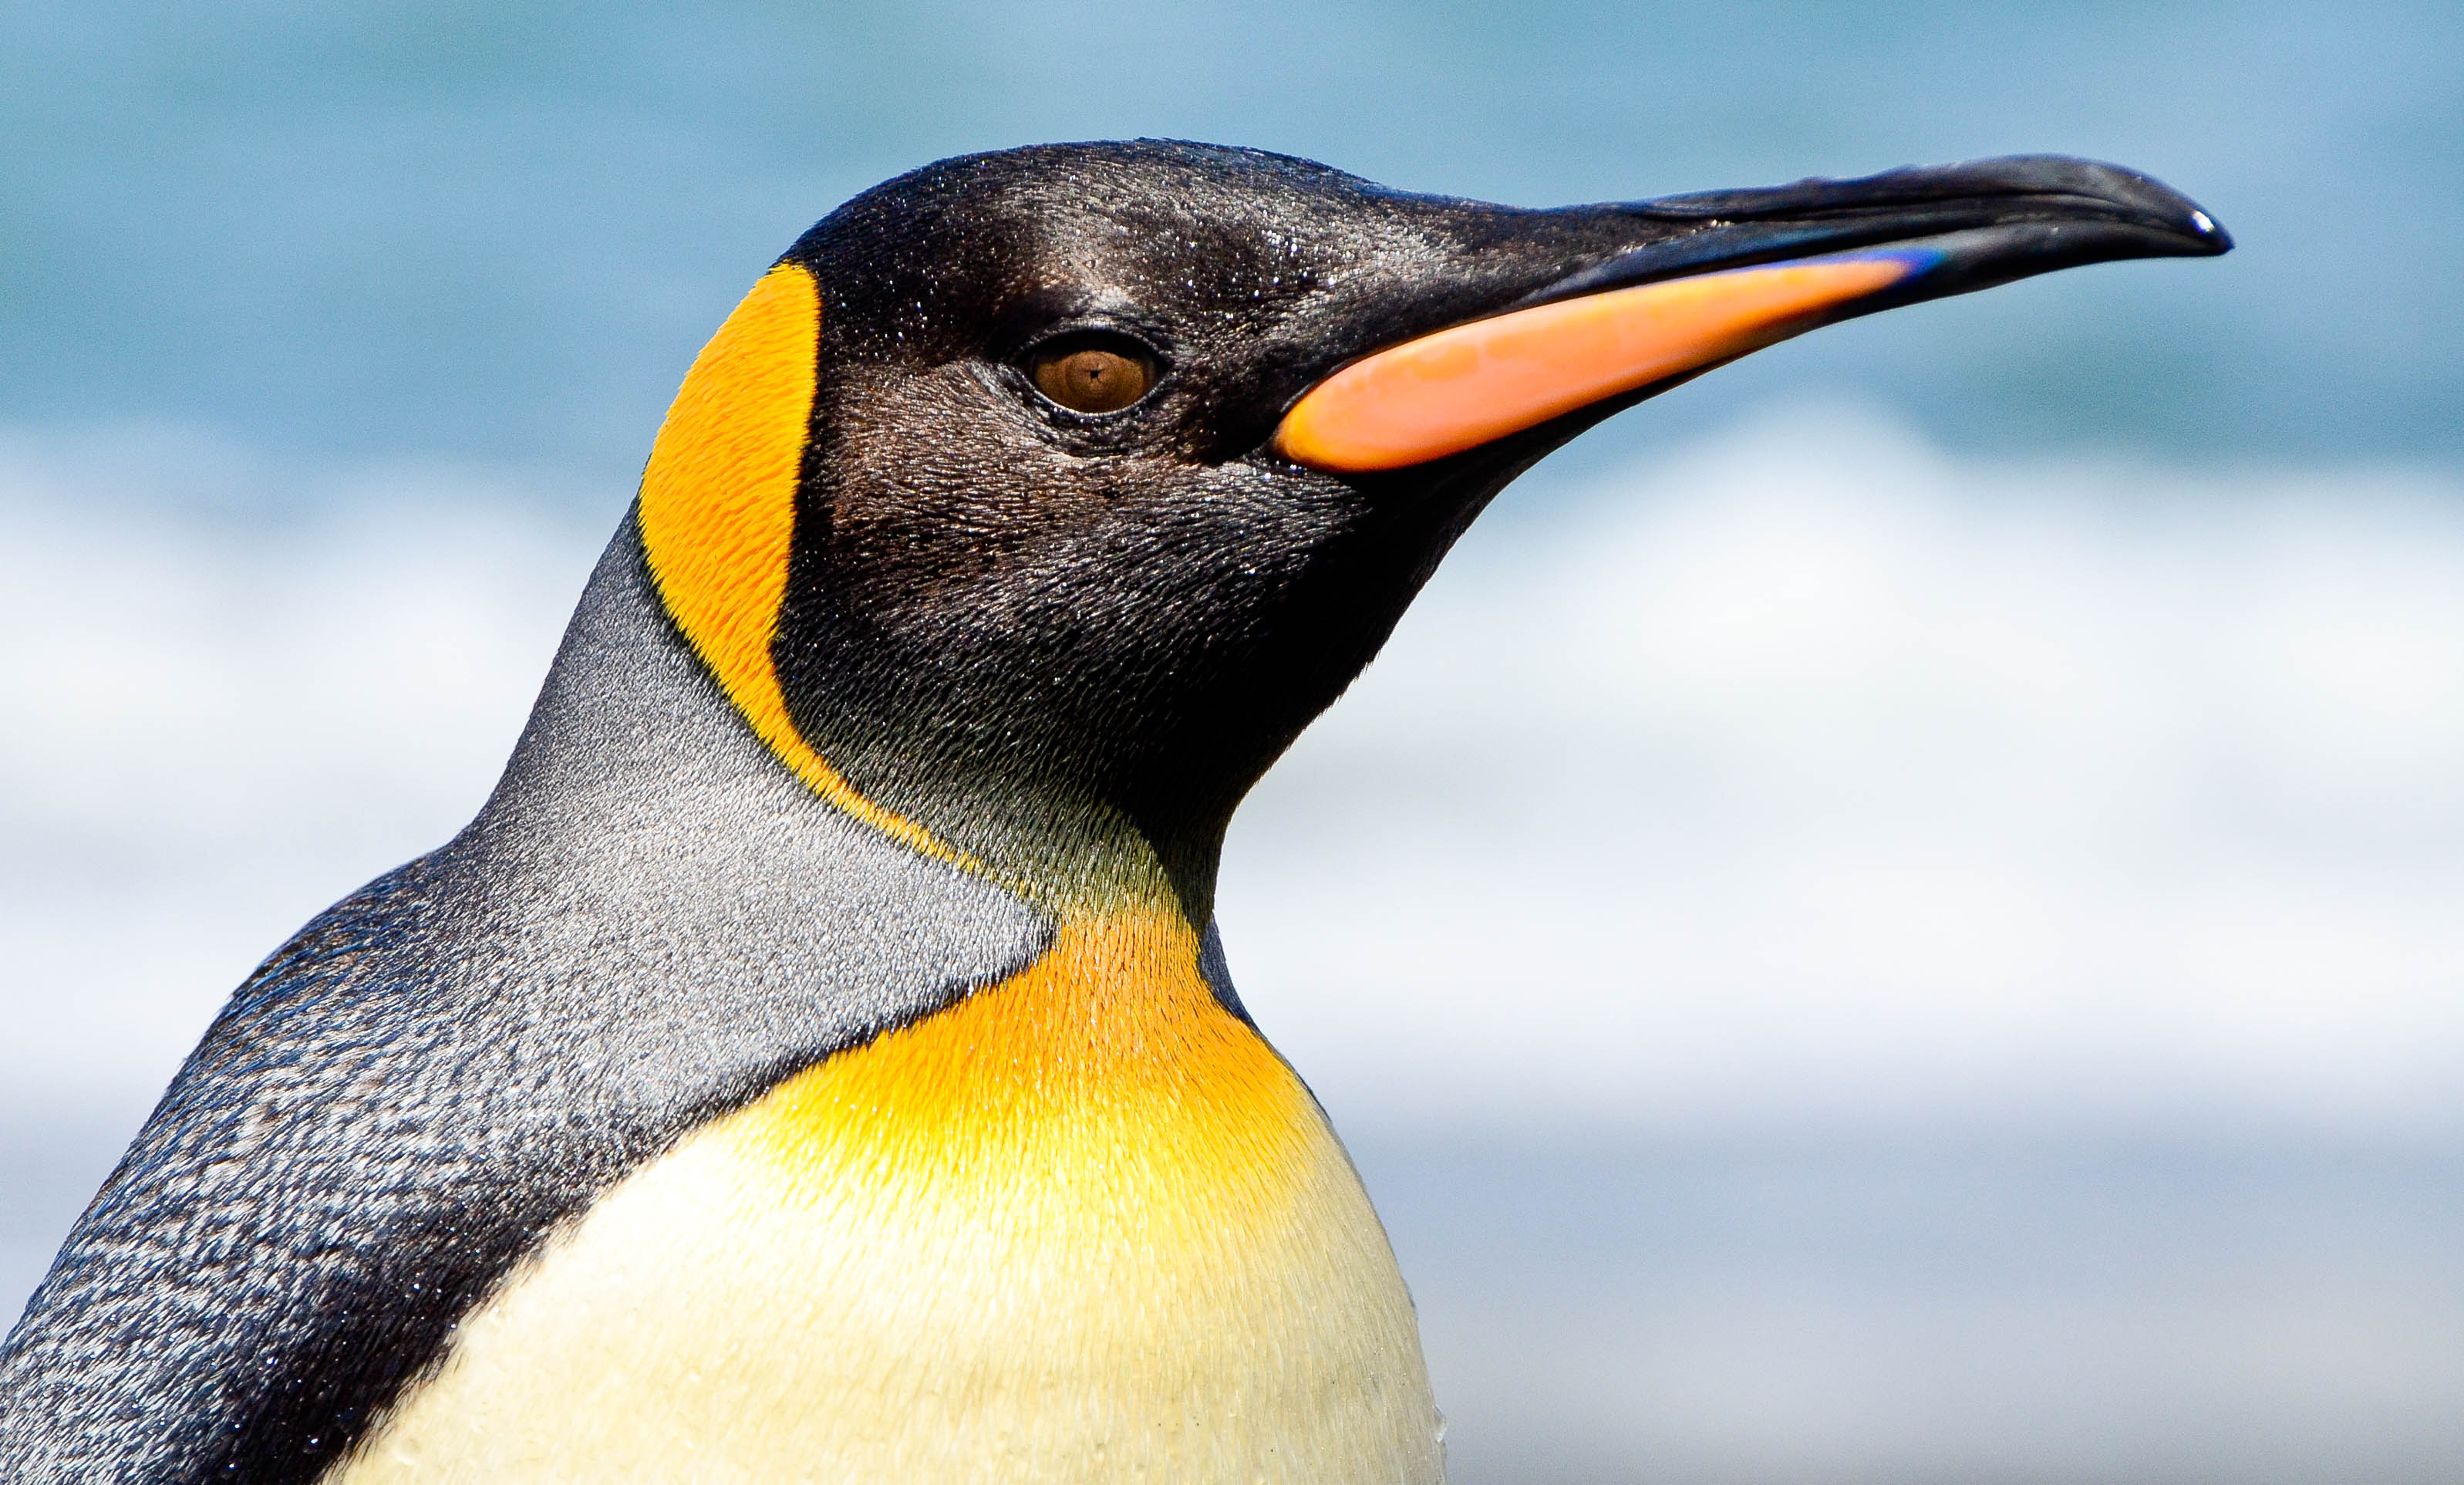 Top 25 Wild Bird Photographs Of The Week 74 National